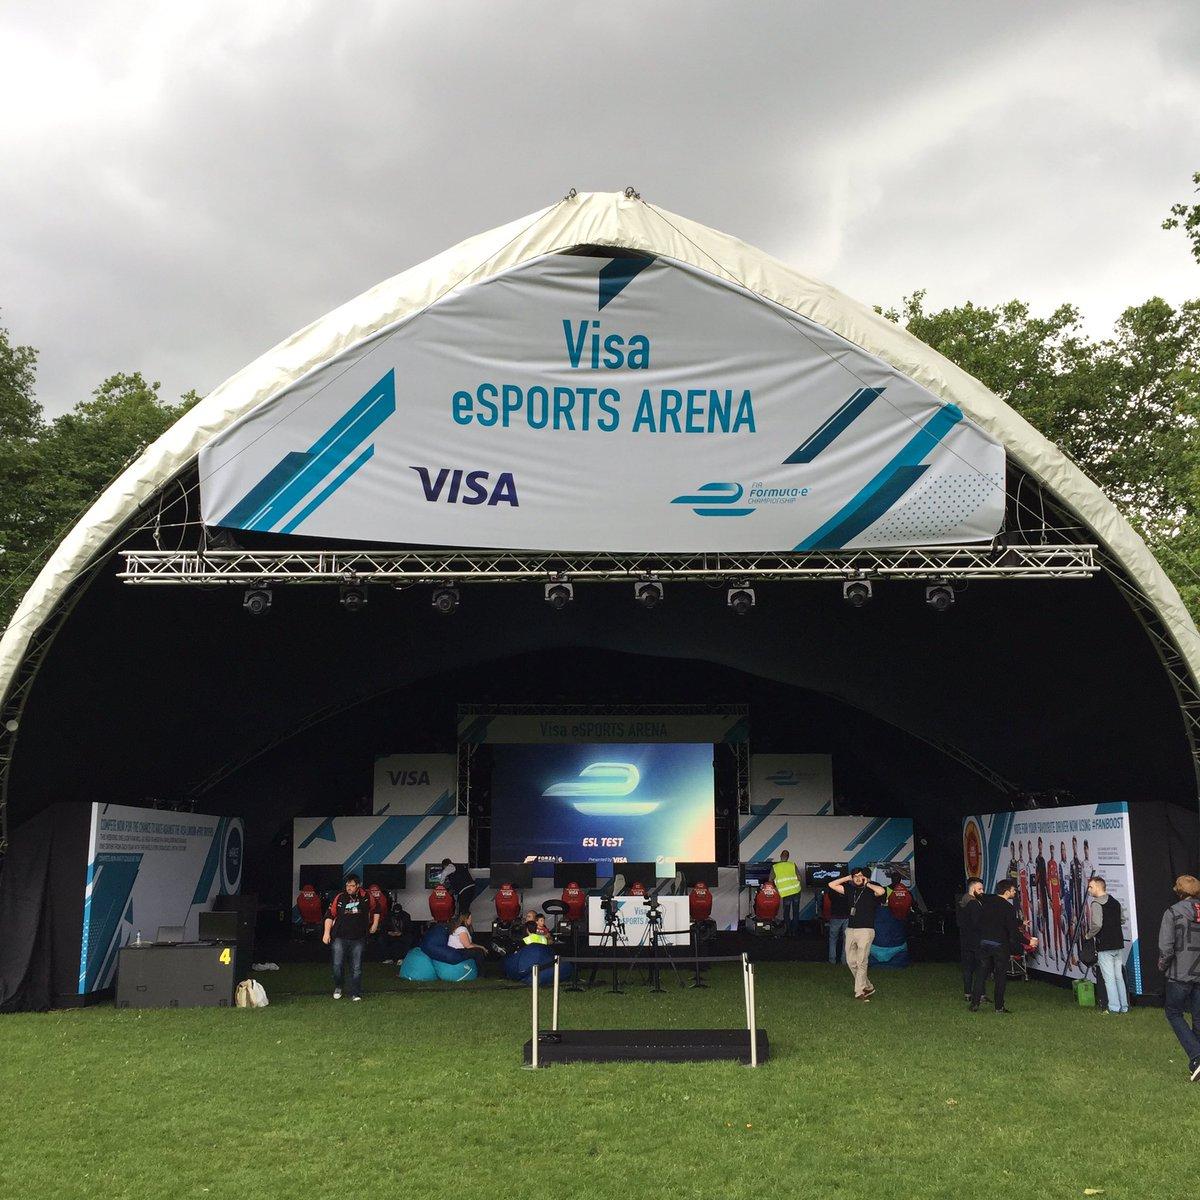 Visa London ePrix eSports Event (Photo: Formula E)